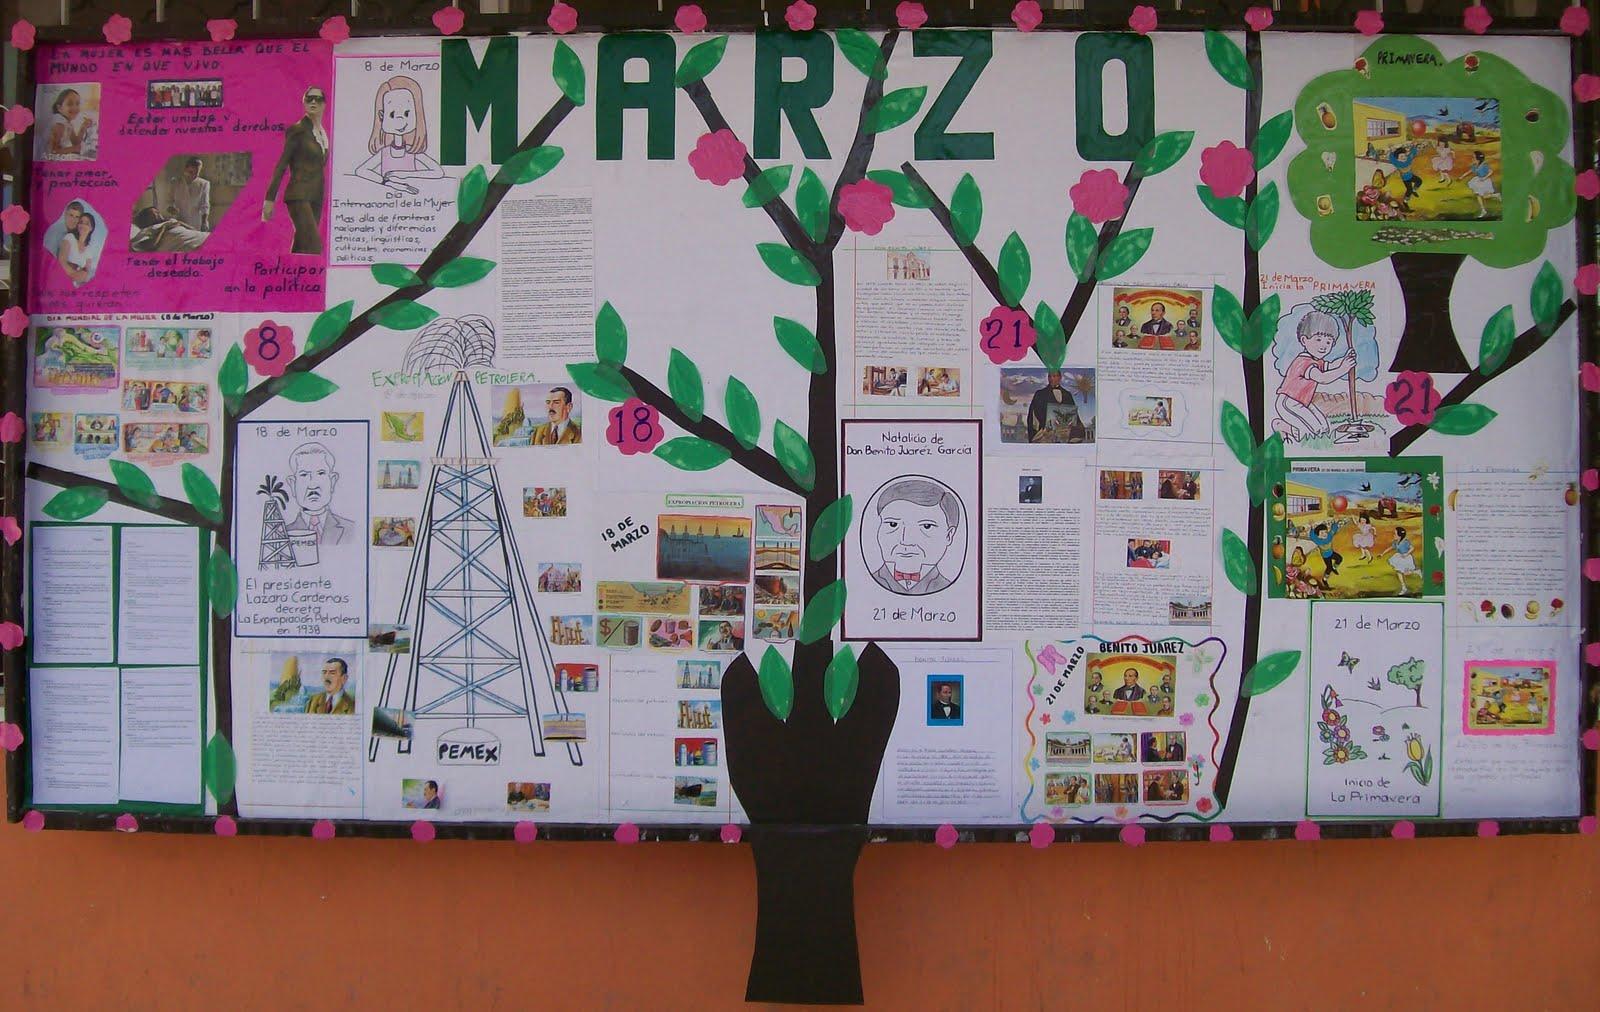 Peri dico mural marzo 8 imagenes educativas for Contenido del periodico mural